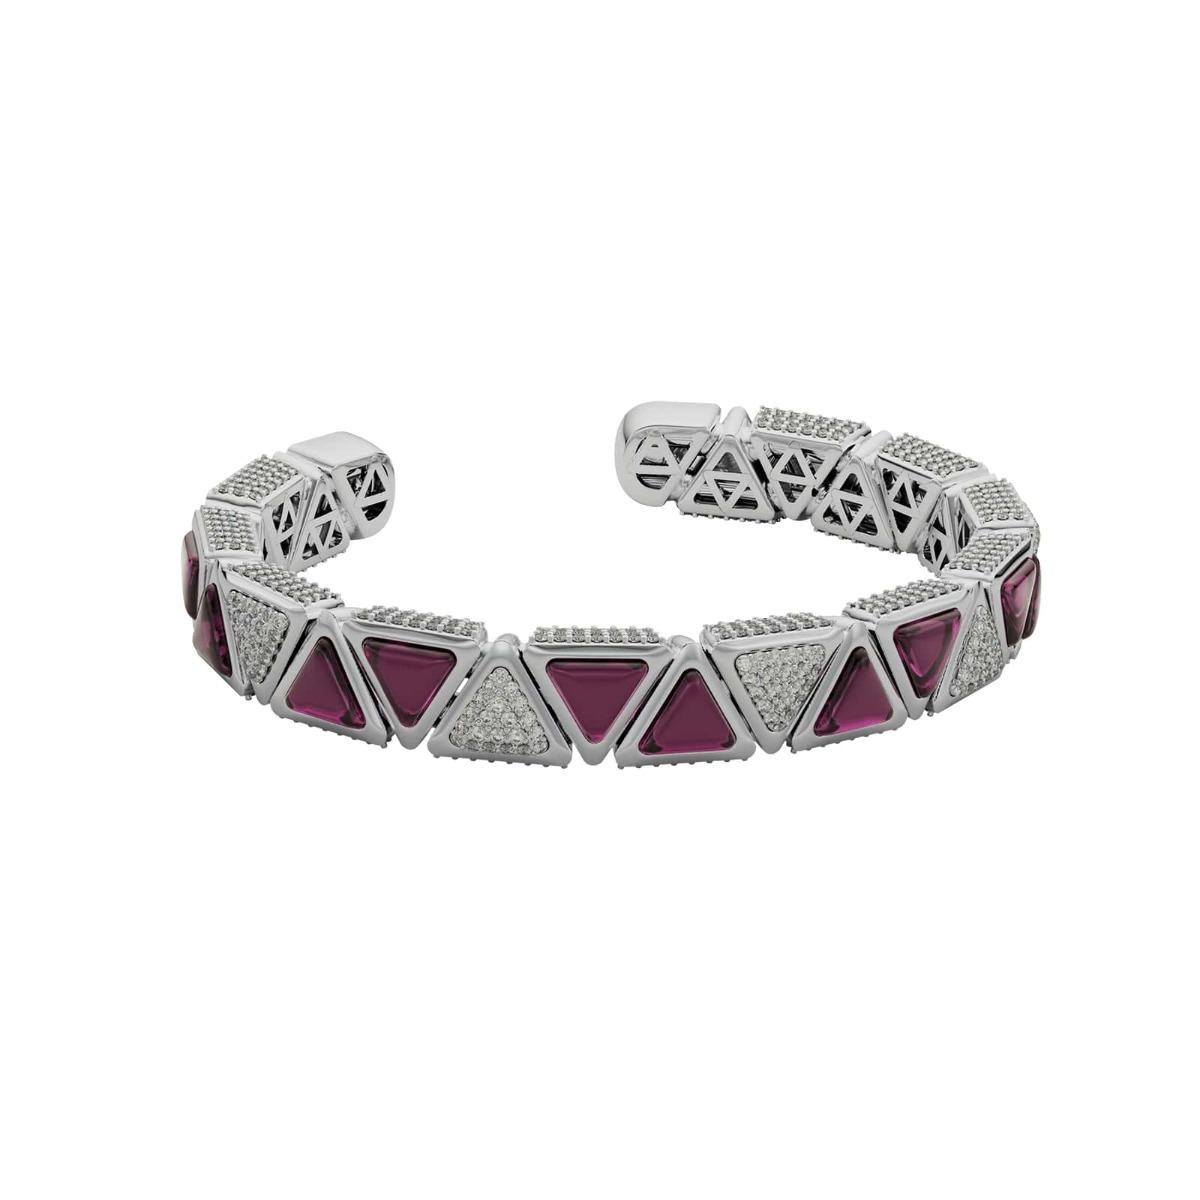 Bracelet BB Mirror Exquisite White Gold Pink Garnet and Diamonds